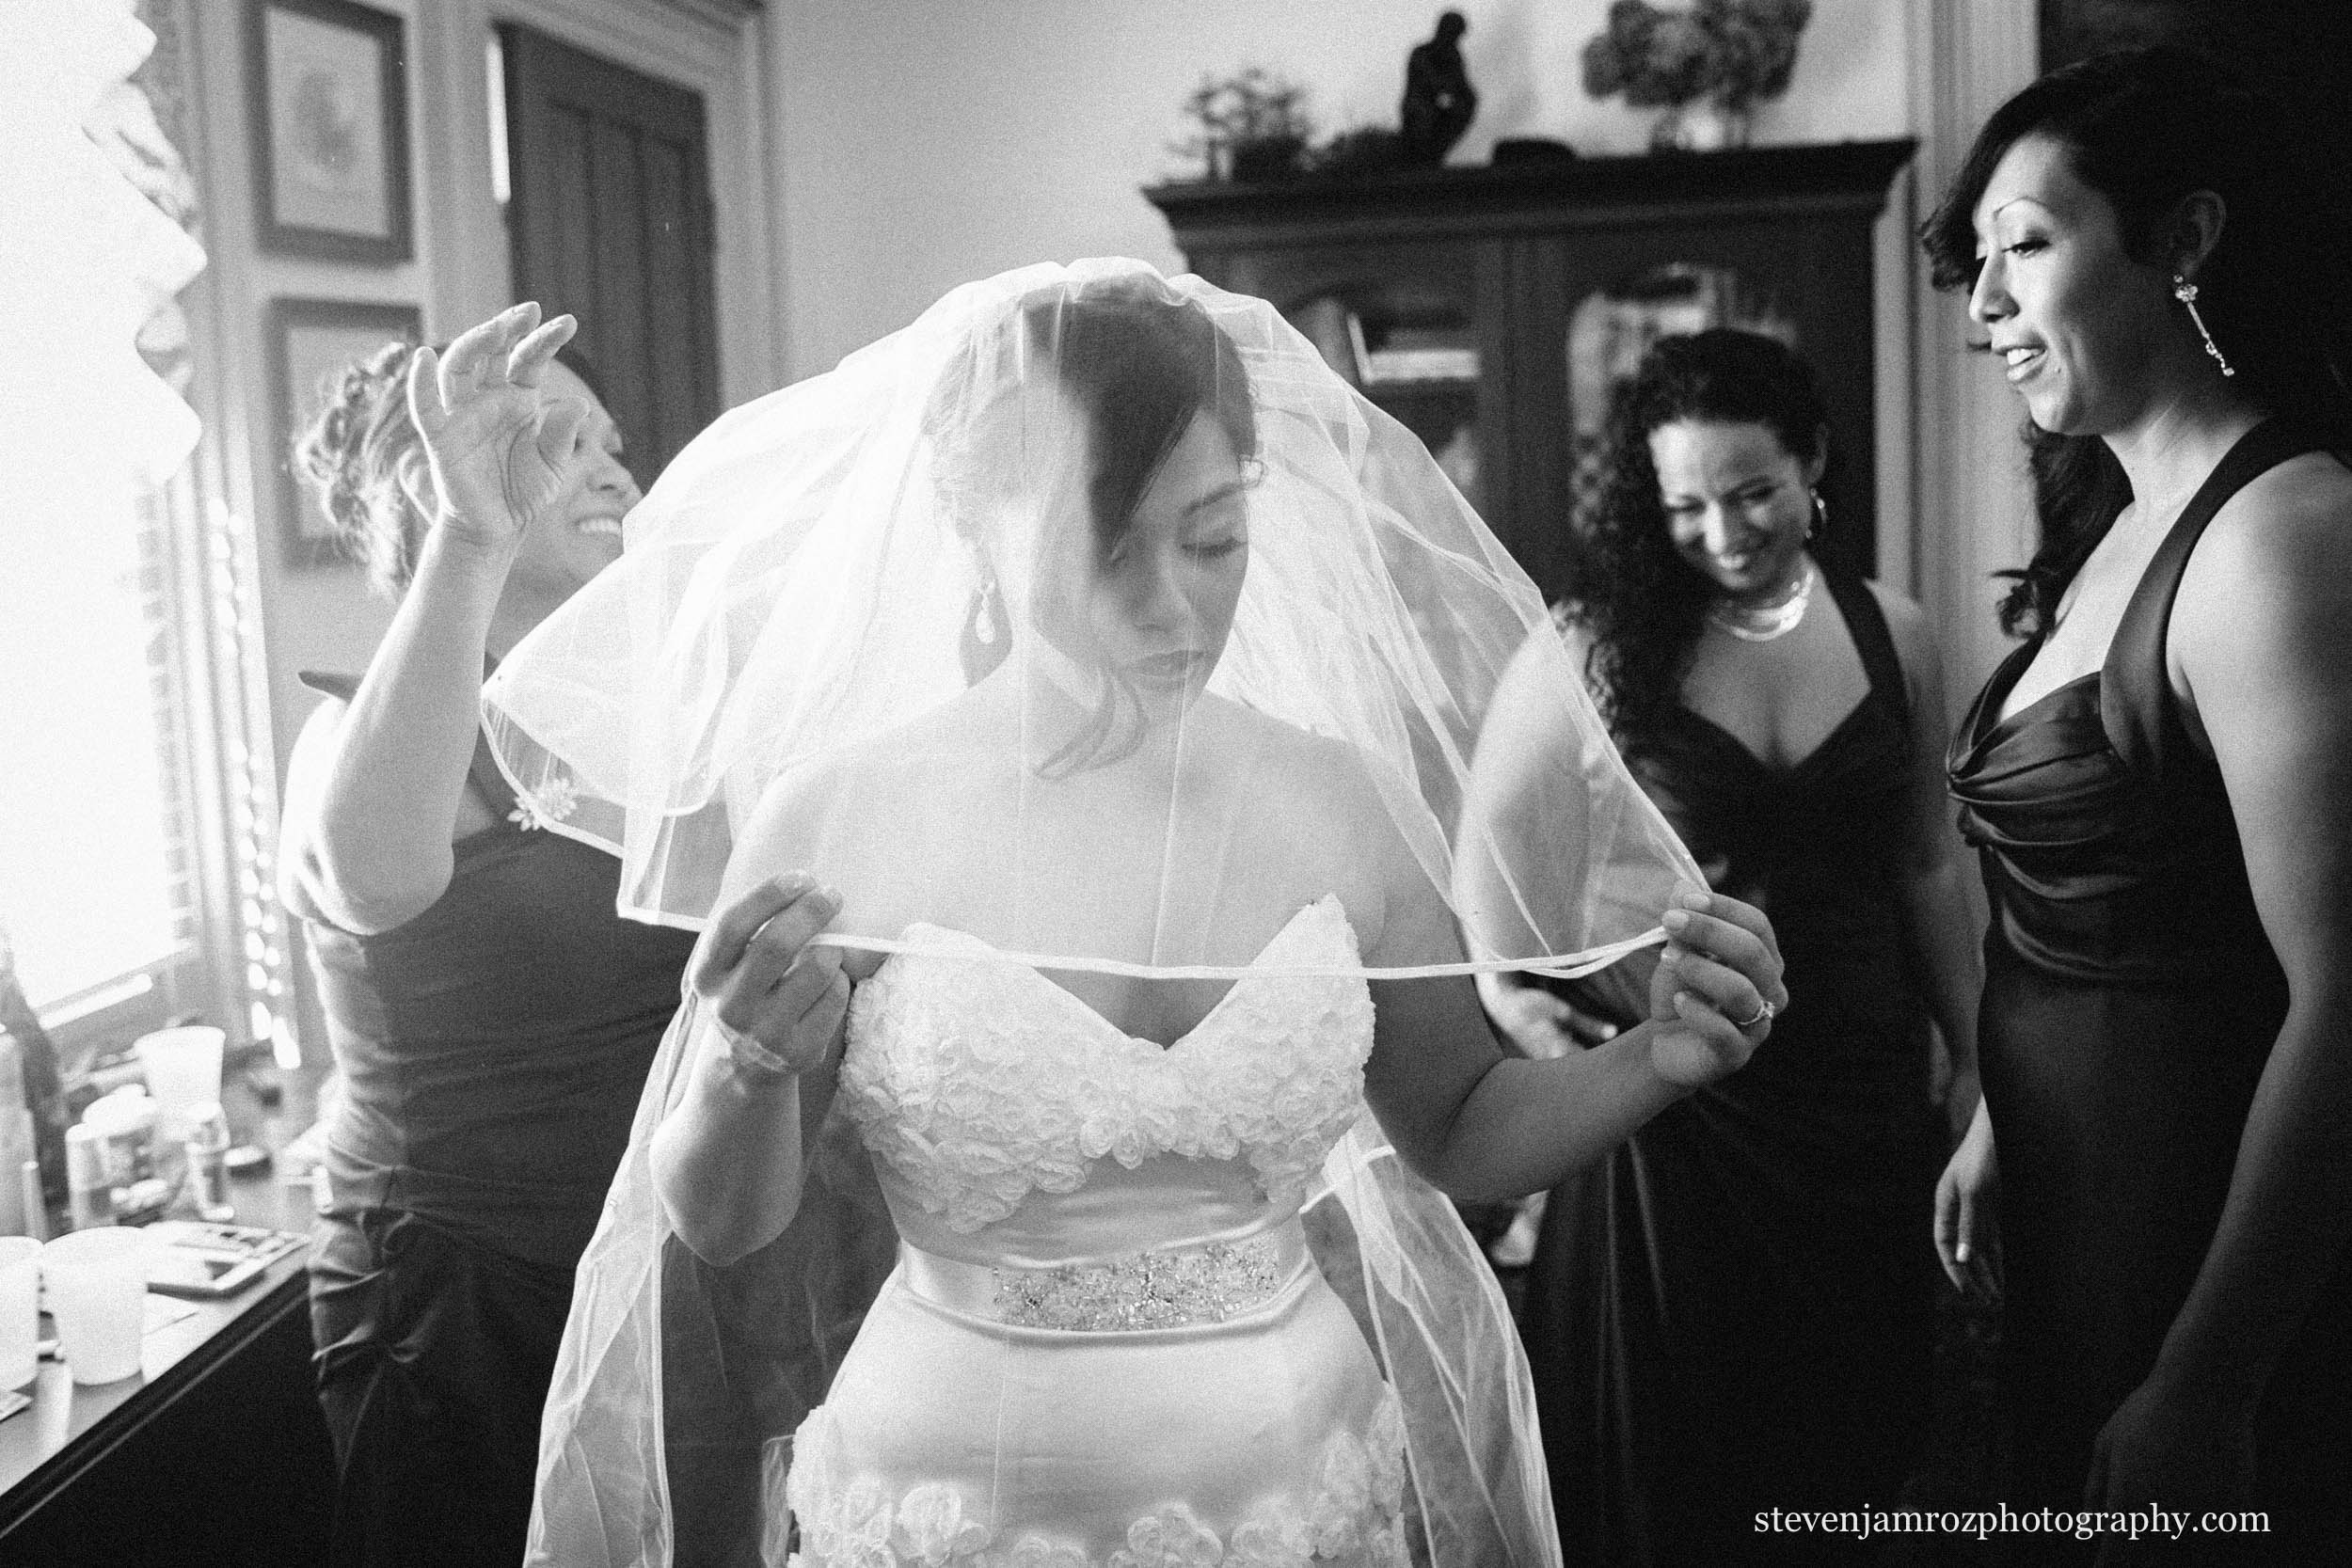 adjust-veil-wedding-warrenton-nc-steven-jamroz-photography-0078.jpg